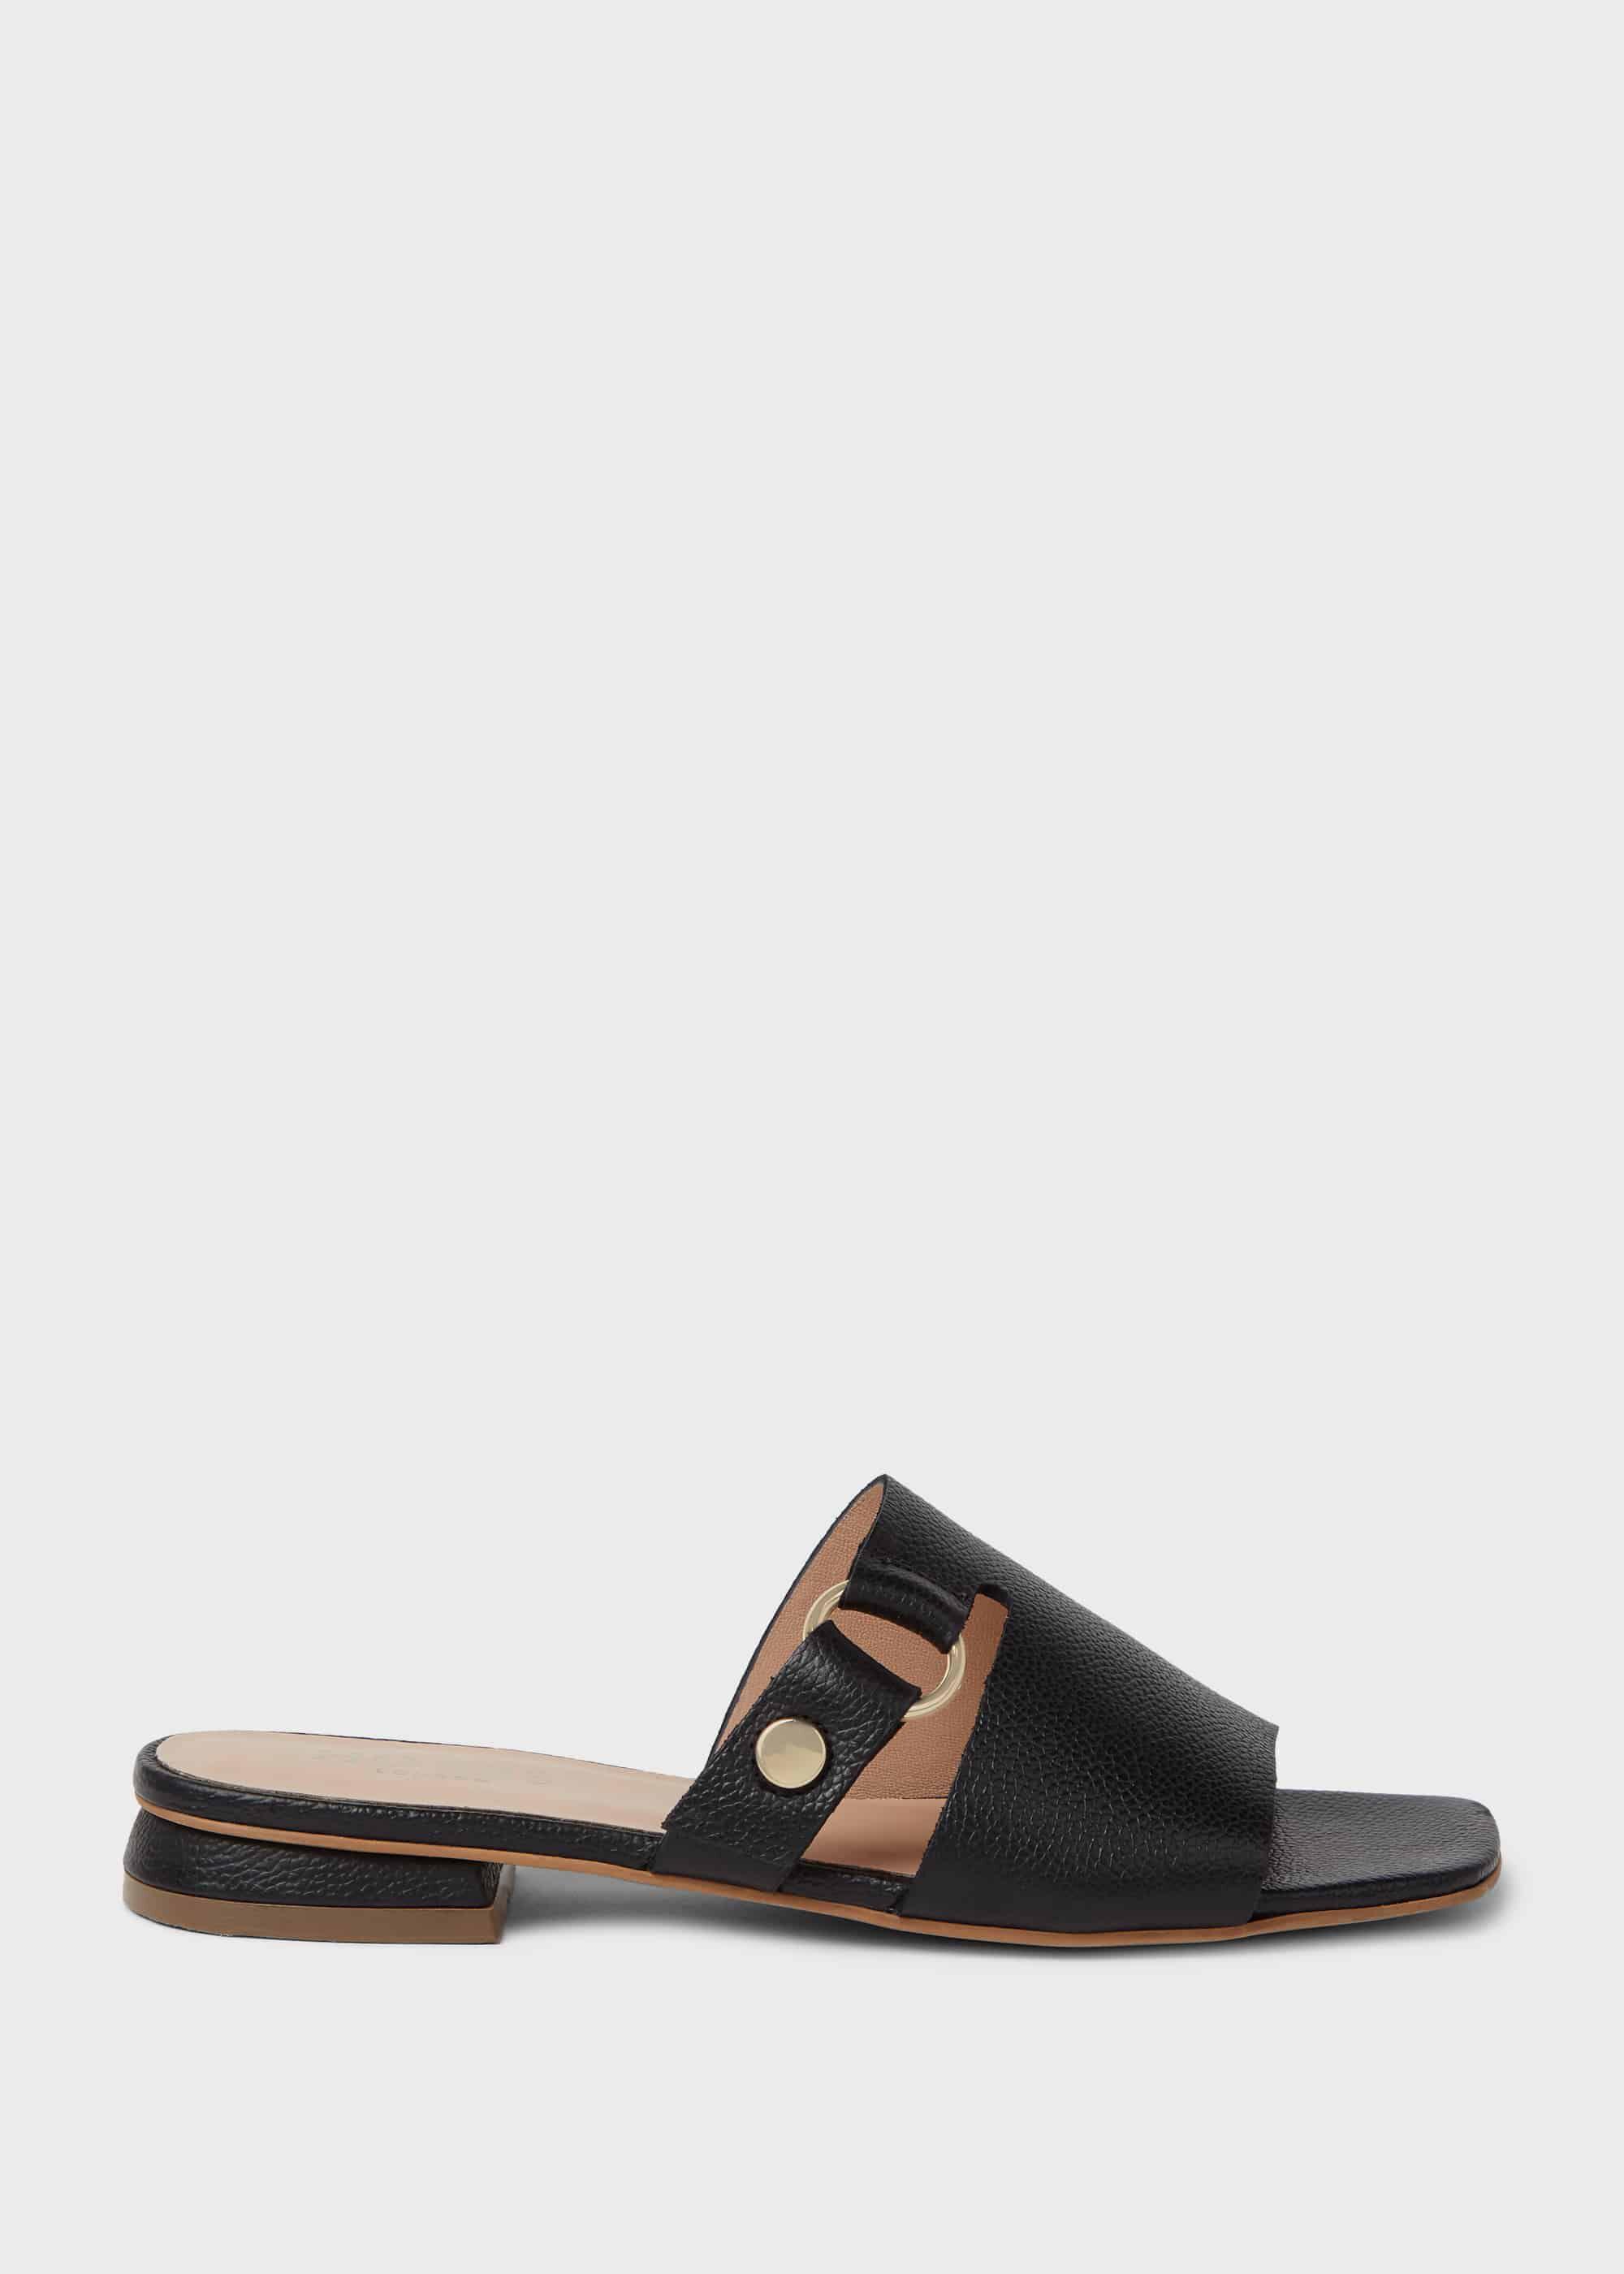 Silver \u0026 Gold Sandals | Hobbs London